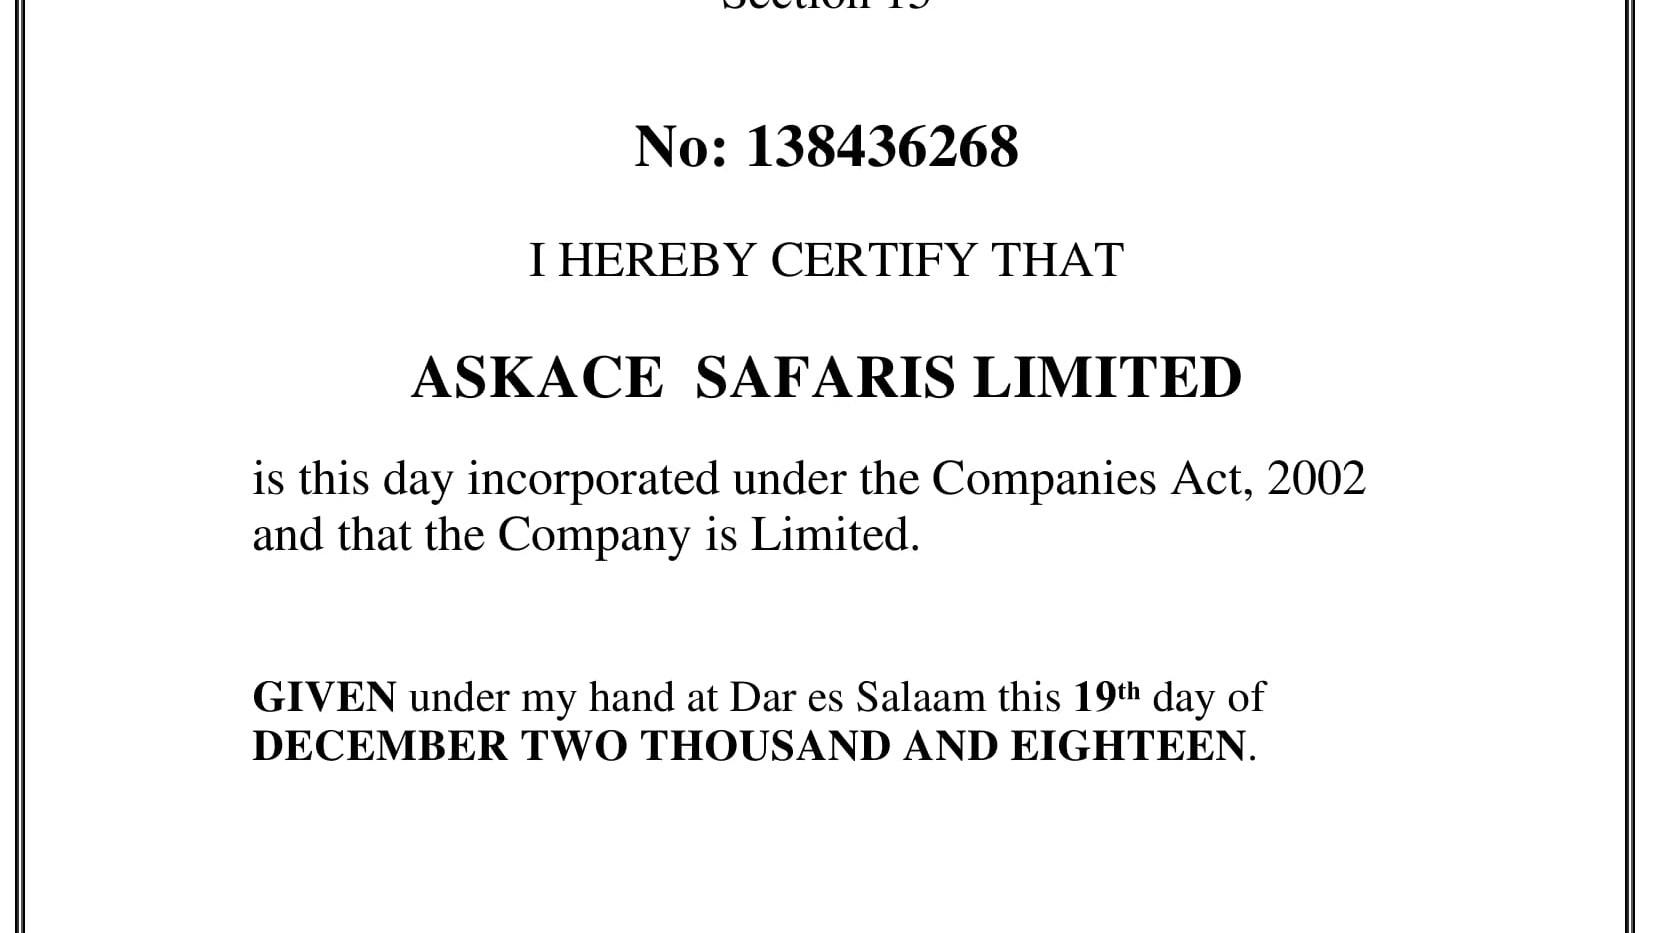 ASKACE SAFARIS LIMITED- CERTIFICATE OF I